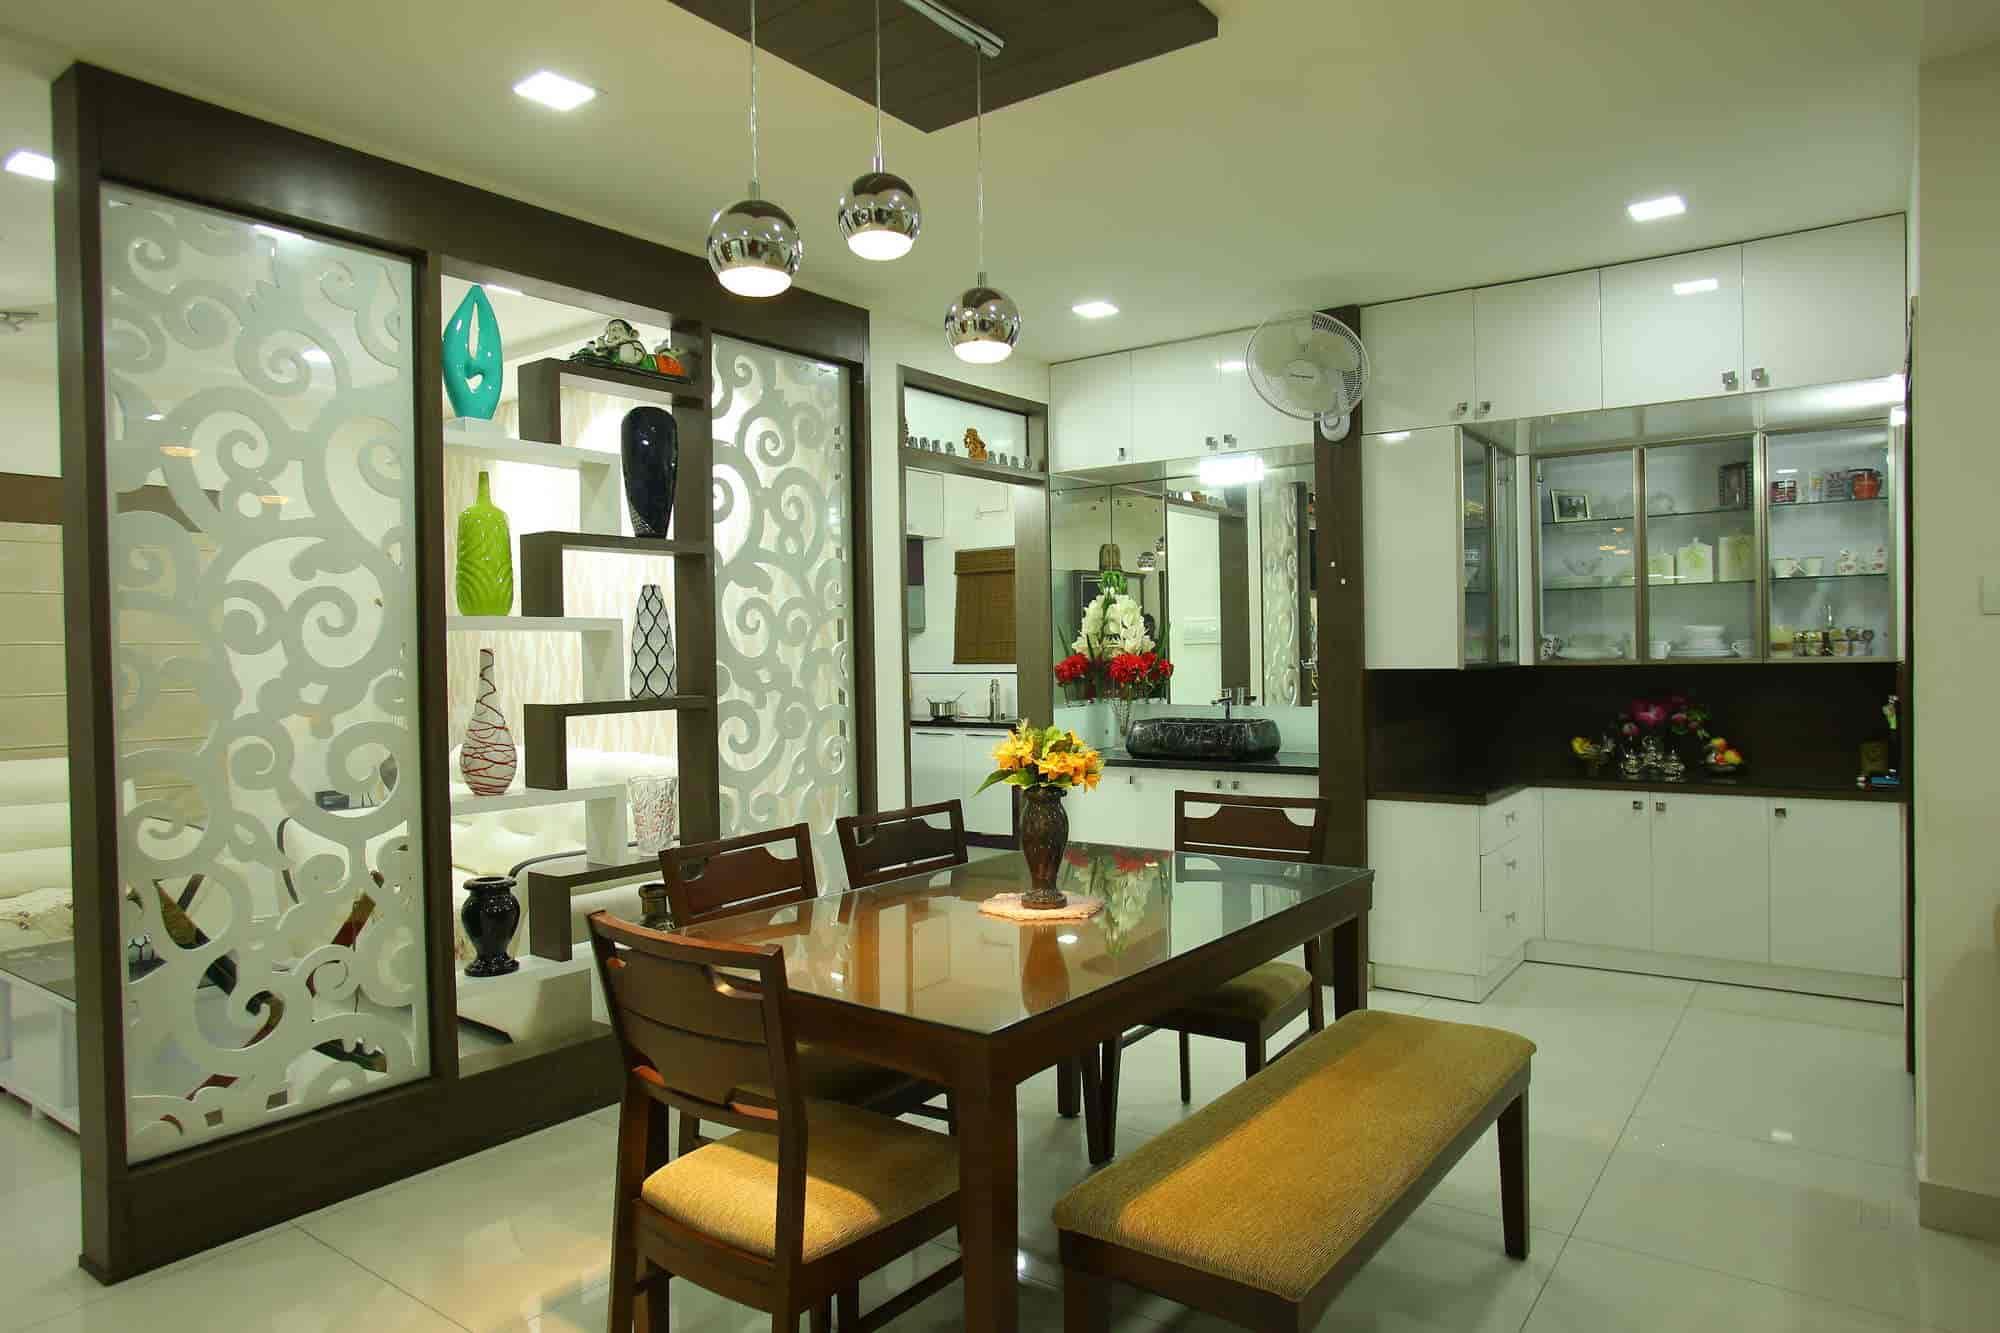 Classy Interiors Kukatpally Housing Board Interior Designers In Hyderabad Justdial